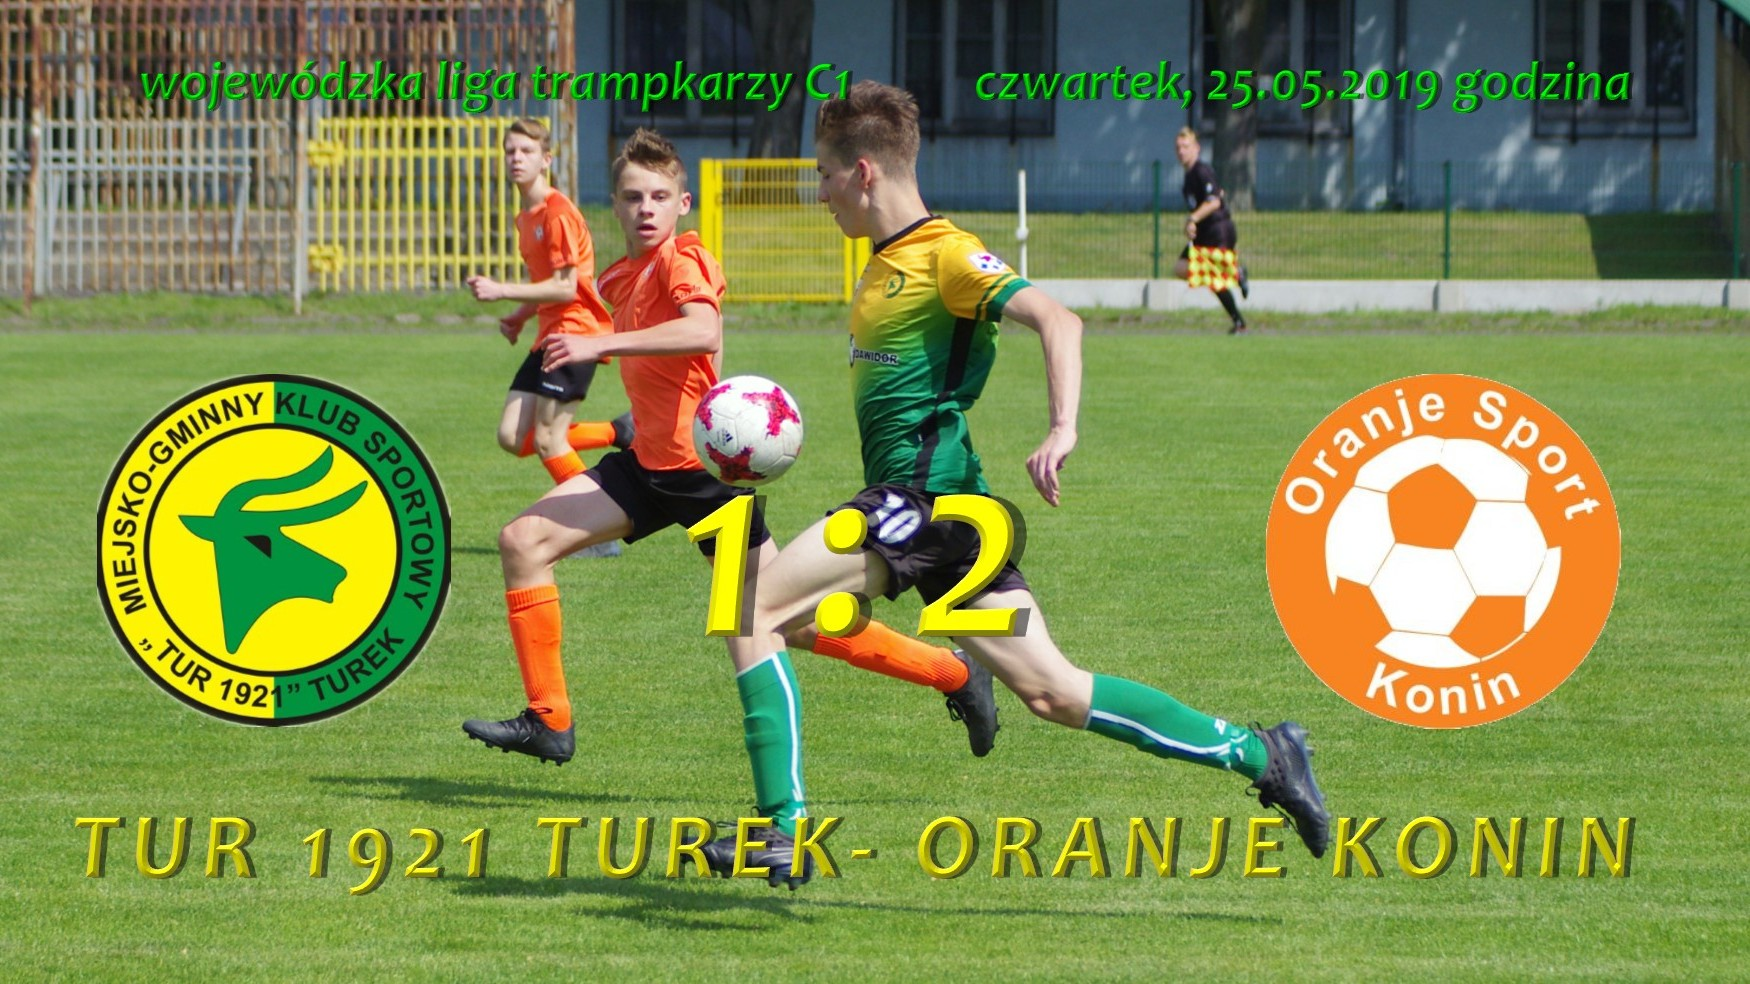 Tur 1921 Turek- Oranje Konin 1:2, C1